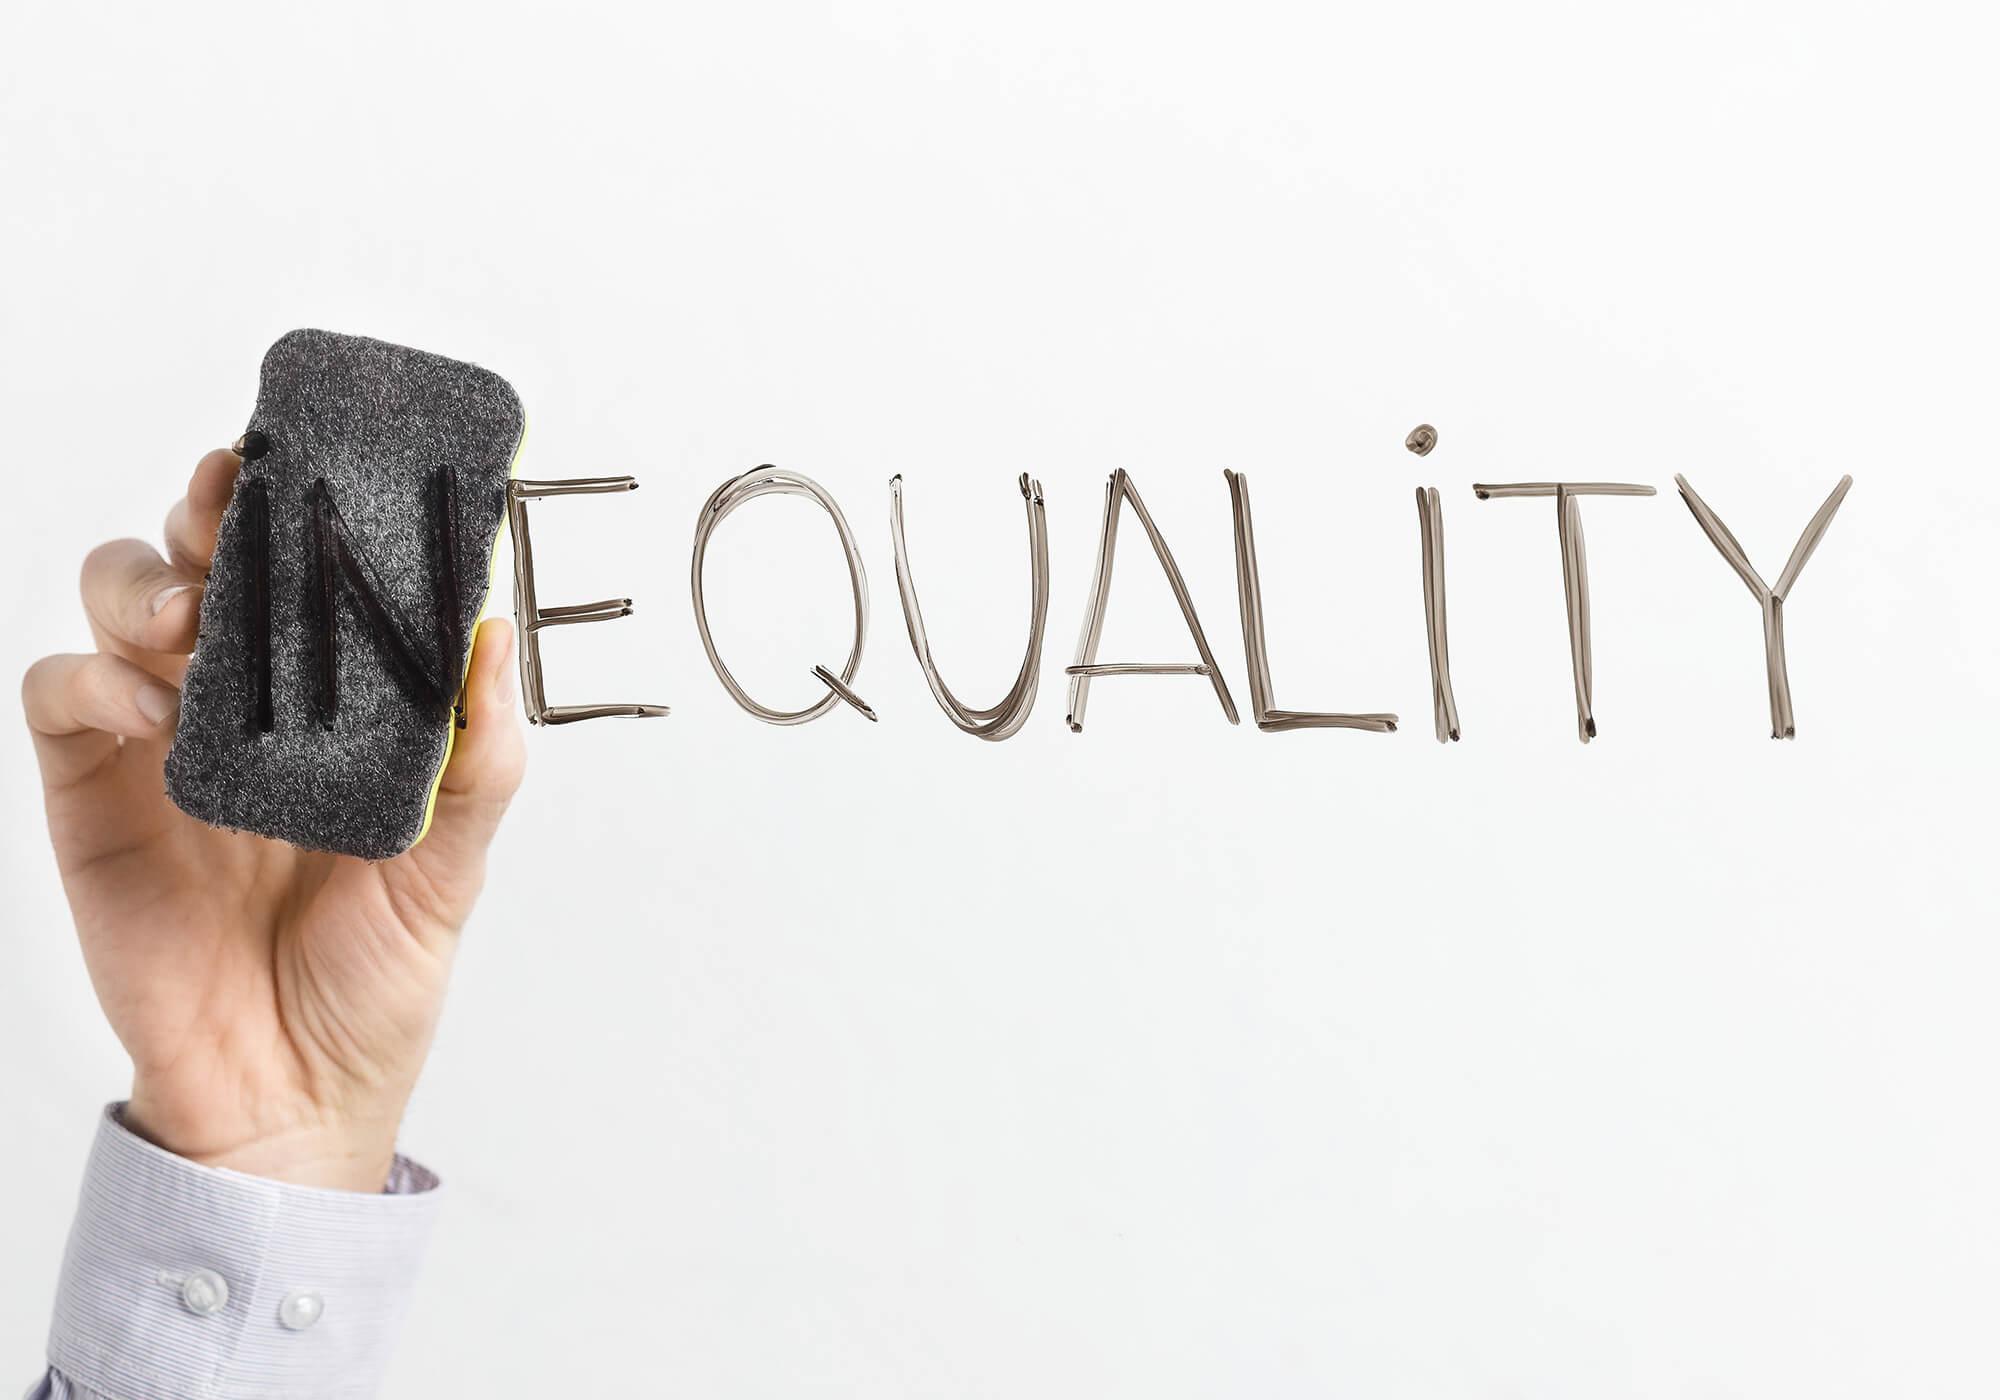 eraser inequality word on white background